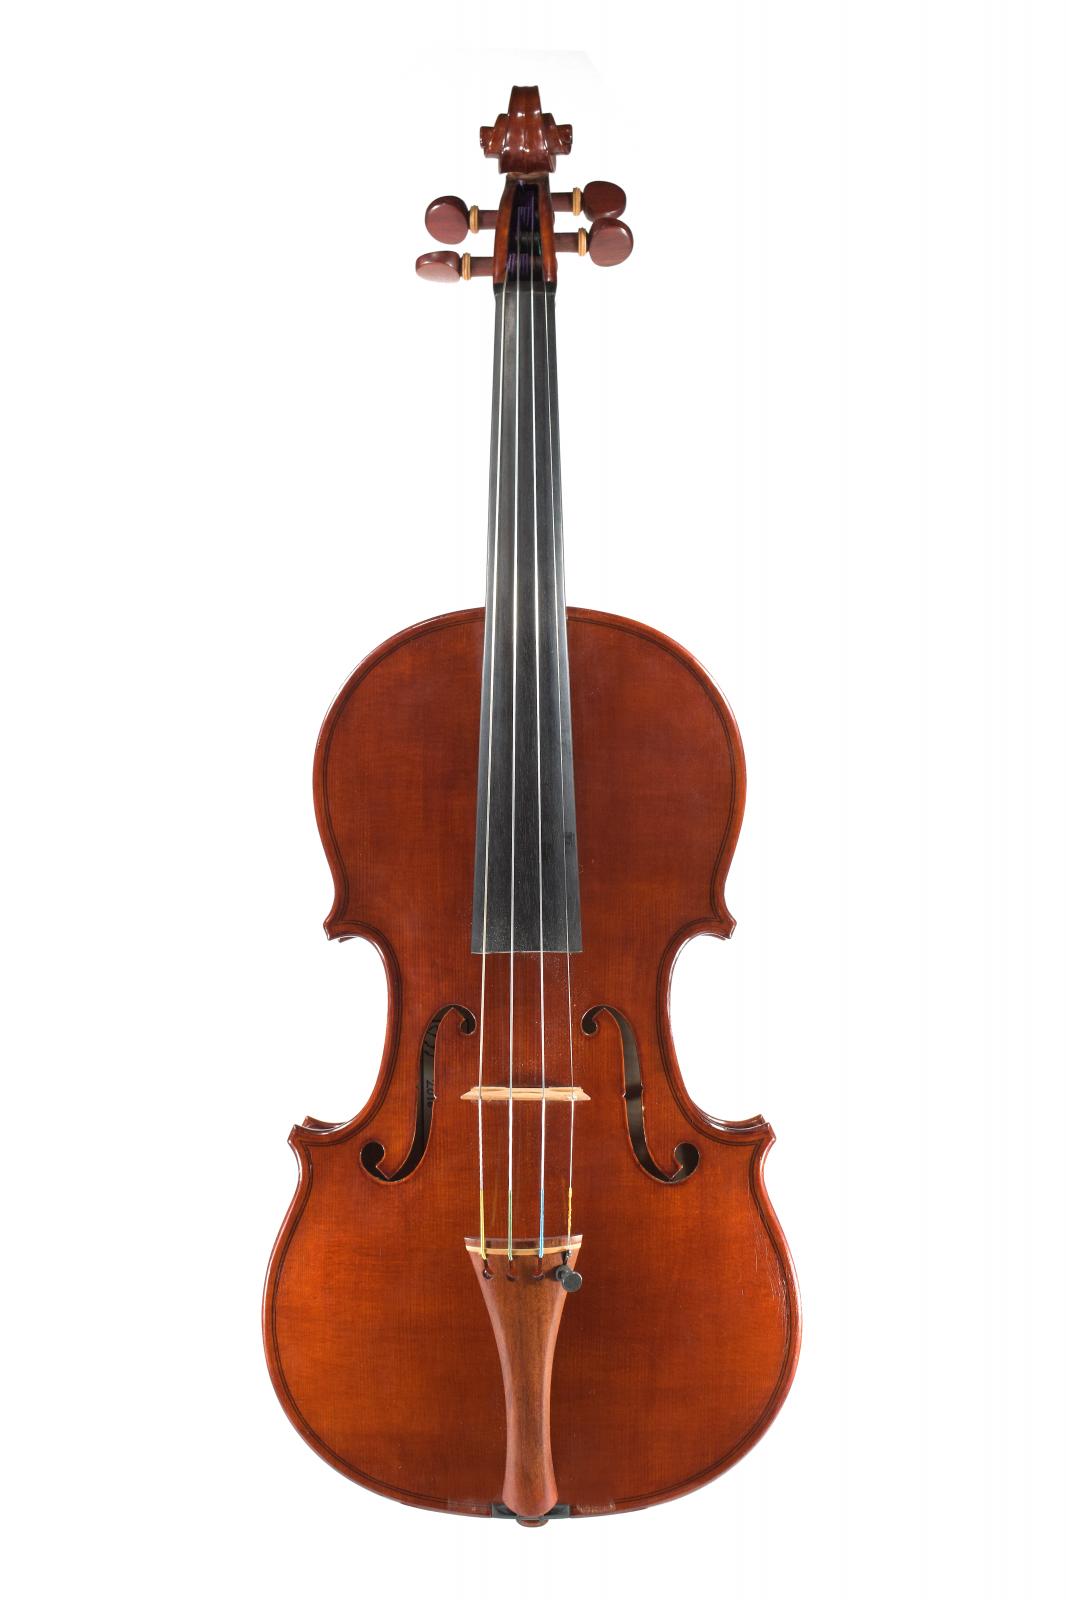 Fine Handmade Violin labeled Mitchell P. McCarthy